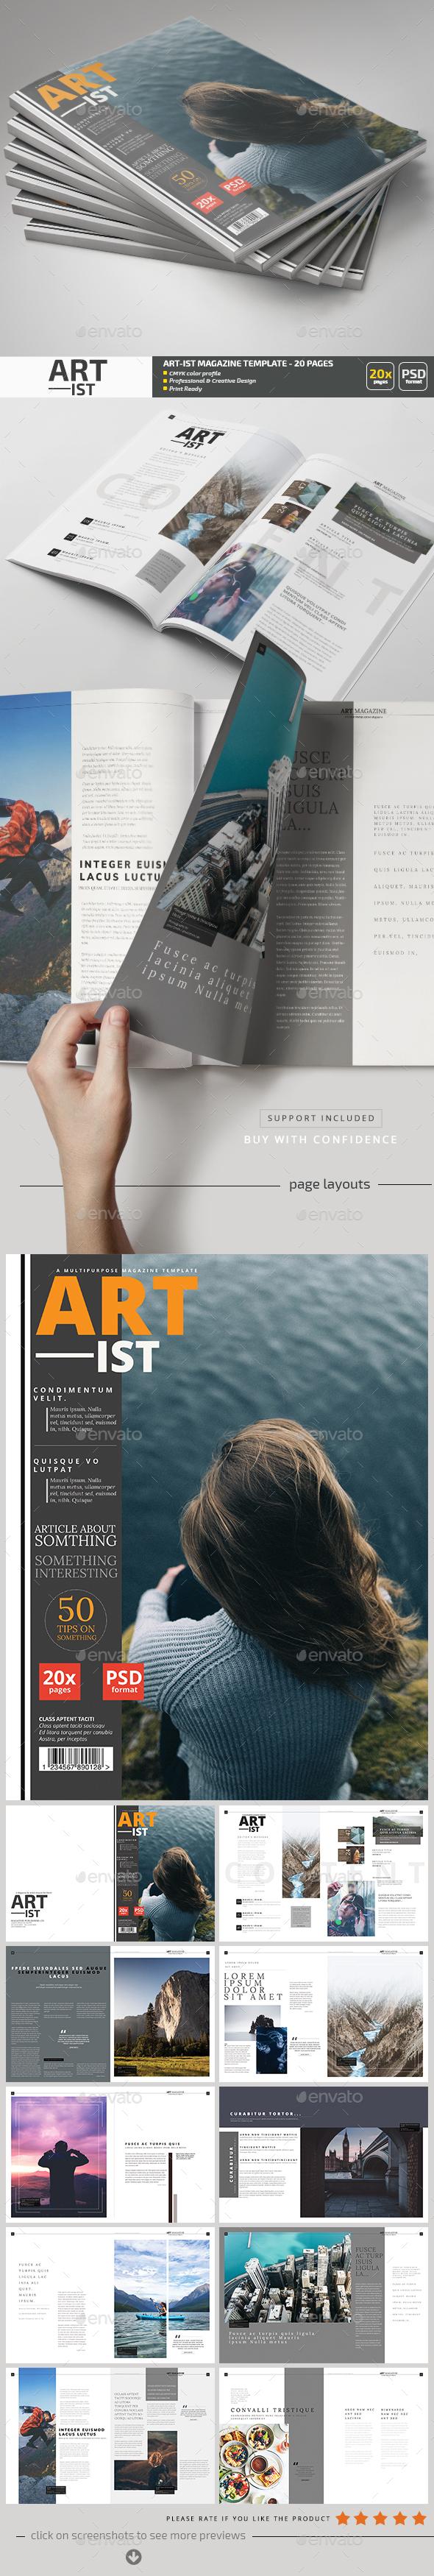 Art-ist Magazine Template V.11 - Magazines Print Templates